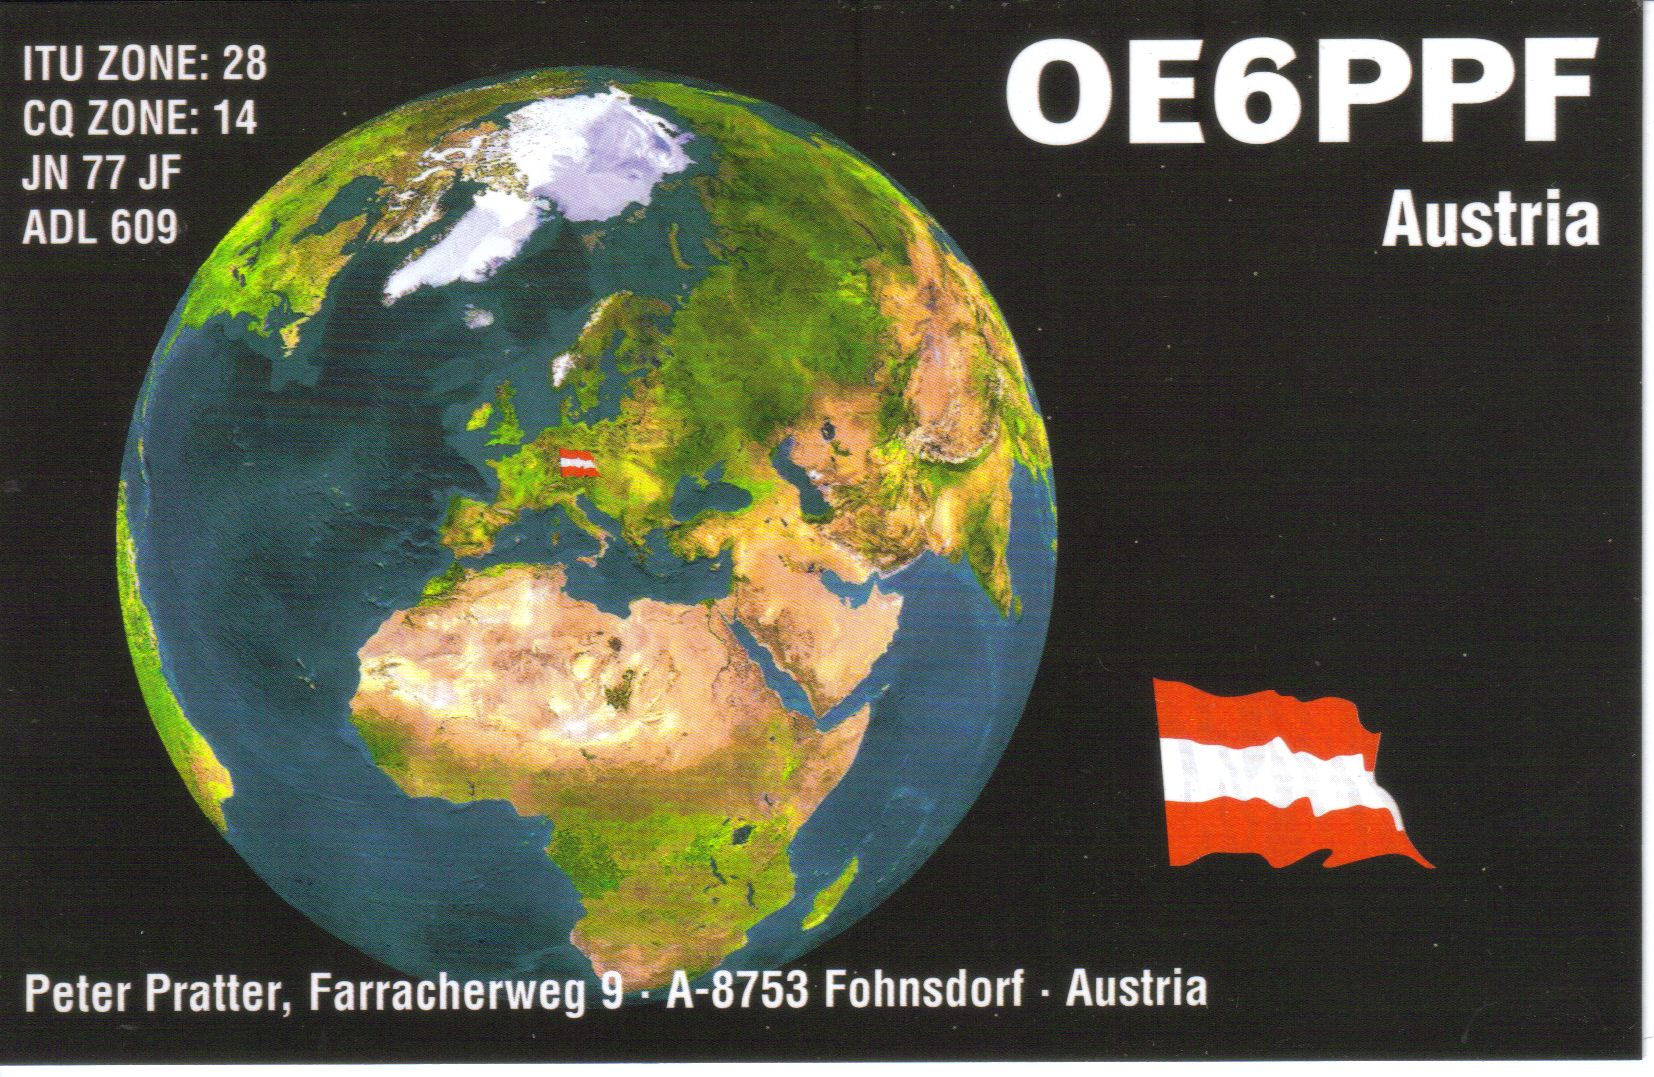 20101225-OE6PPF